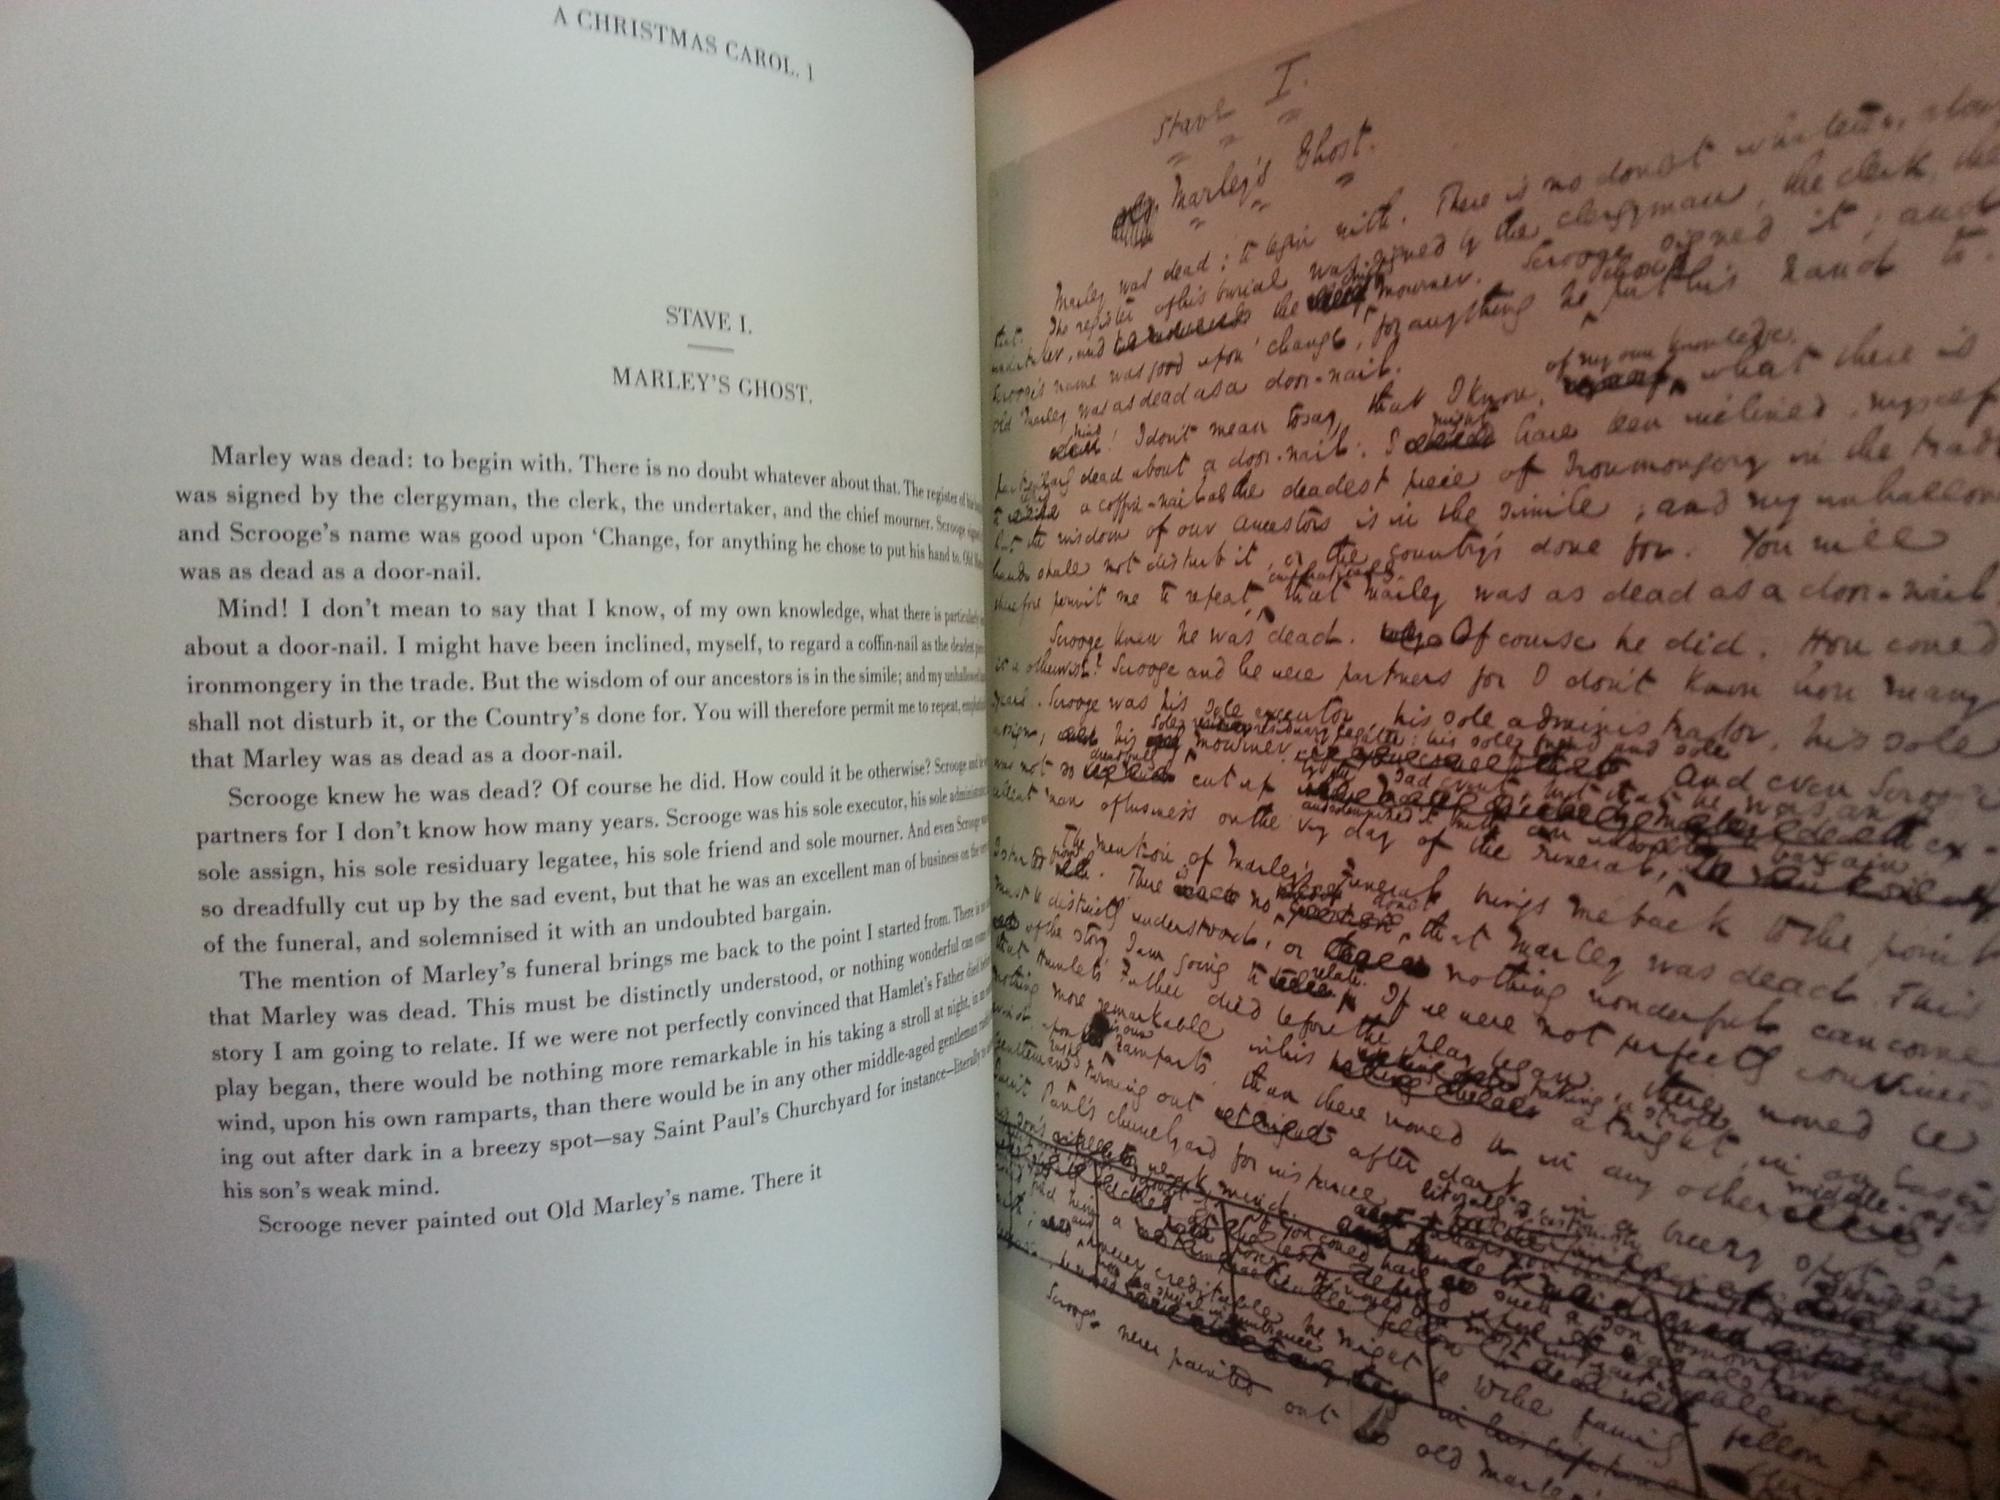 A Christmas Carol - Facsimile Manuscript - FIRST EDITION -: Dickens, Charles